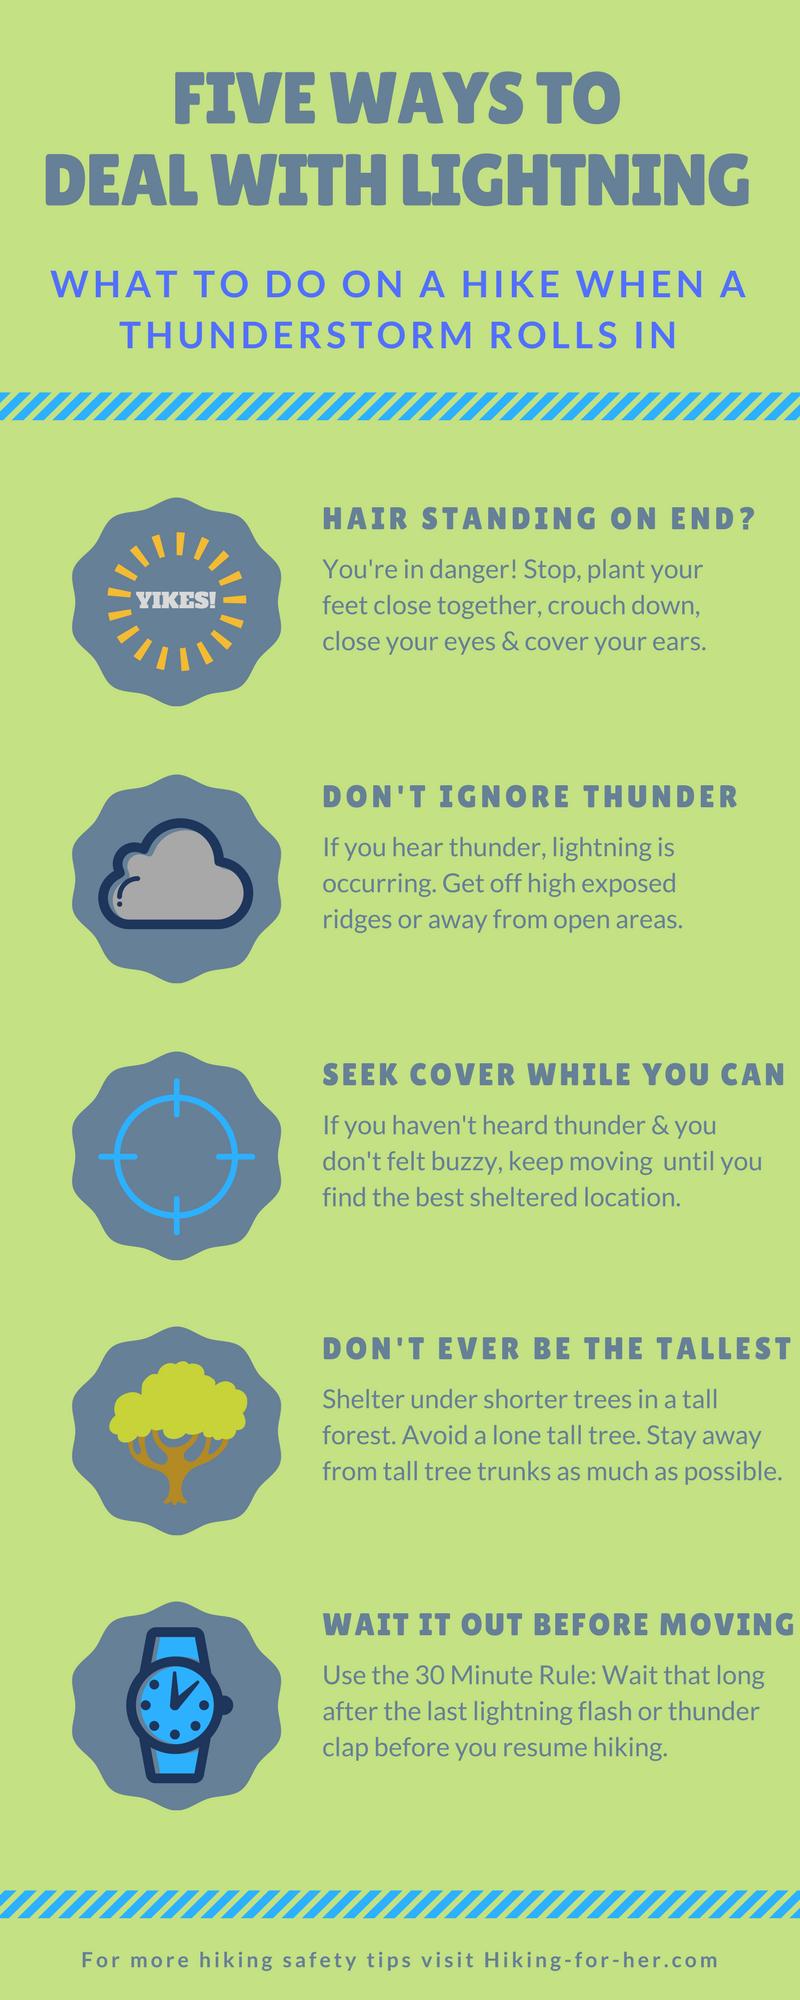 How to deal with lightning on a hike #safehiking #hikingweather #lightningtips #staysafeoutdoors #outdoorsafety #hiking #backpacking #hikinginfographic